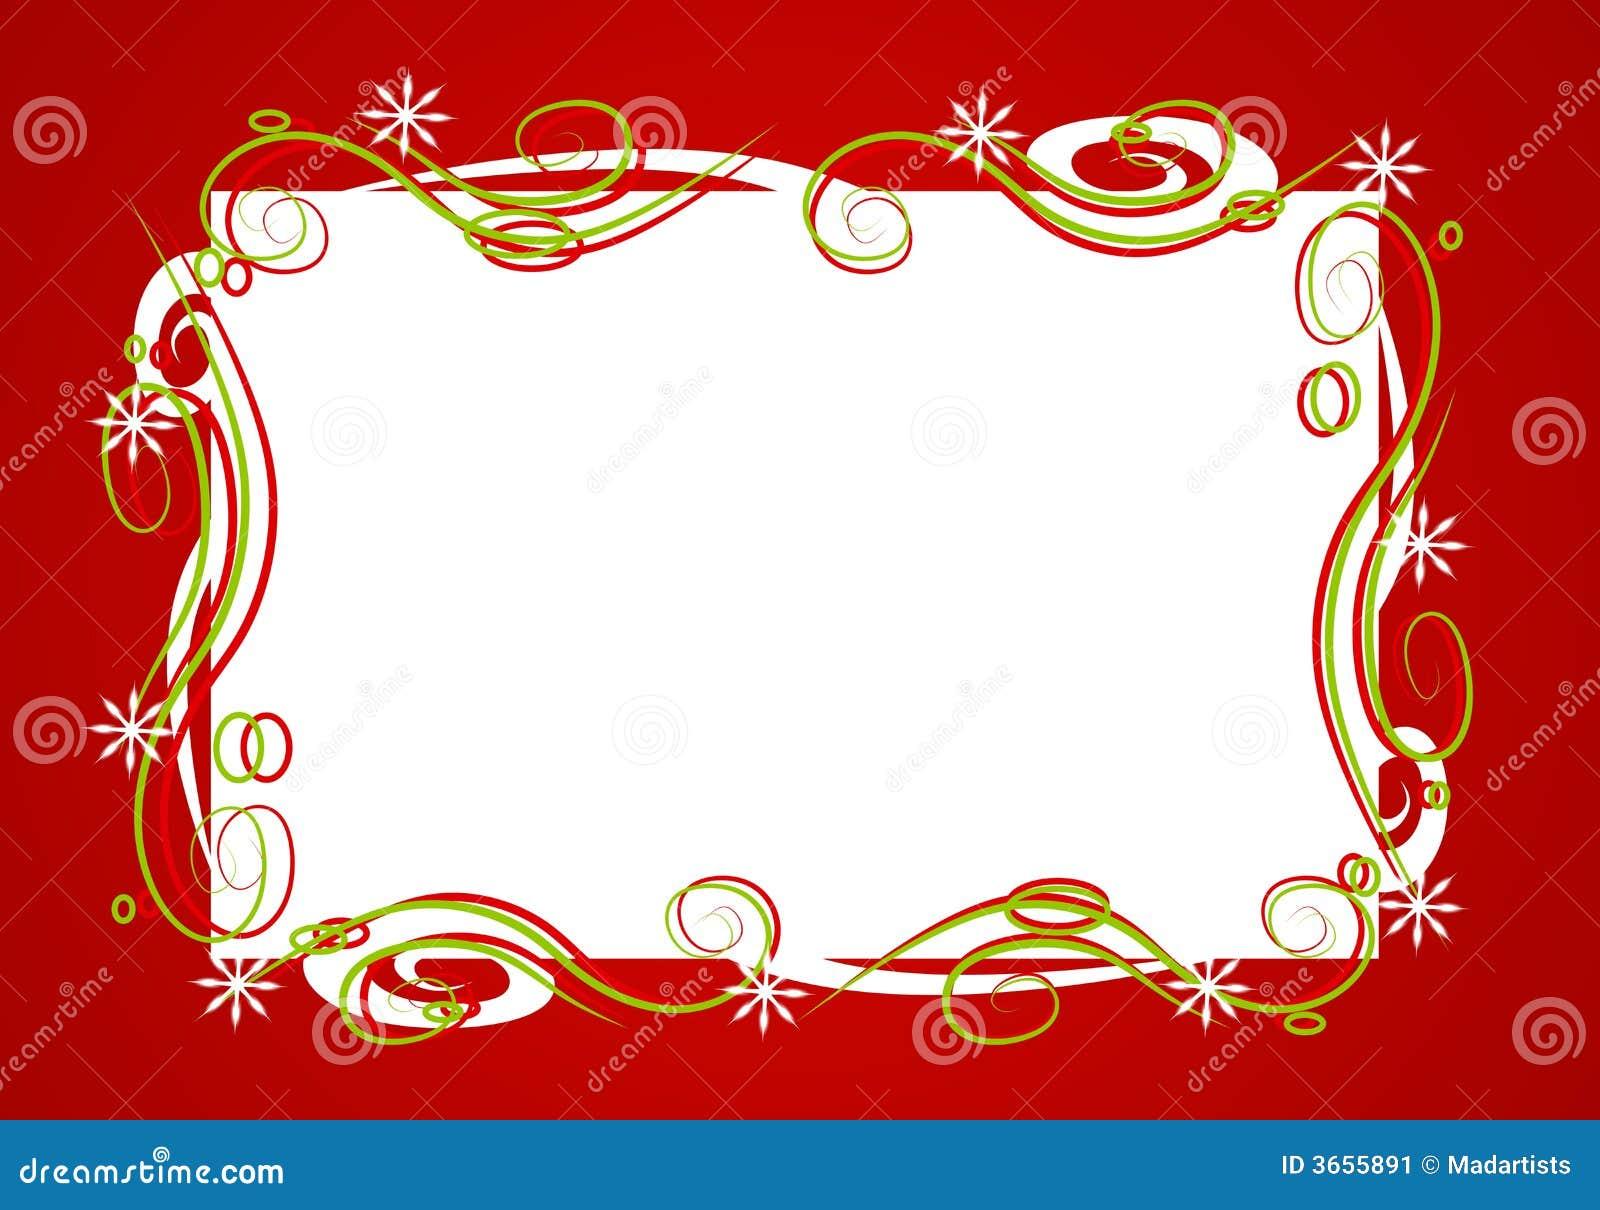 Decorative Red Christmas Frame Stock Image - Image: 3655891